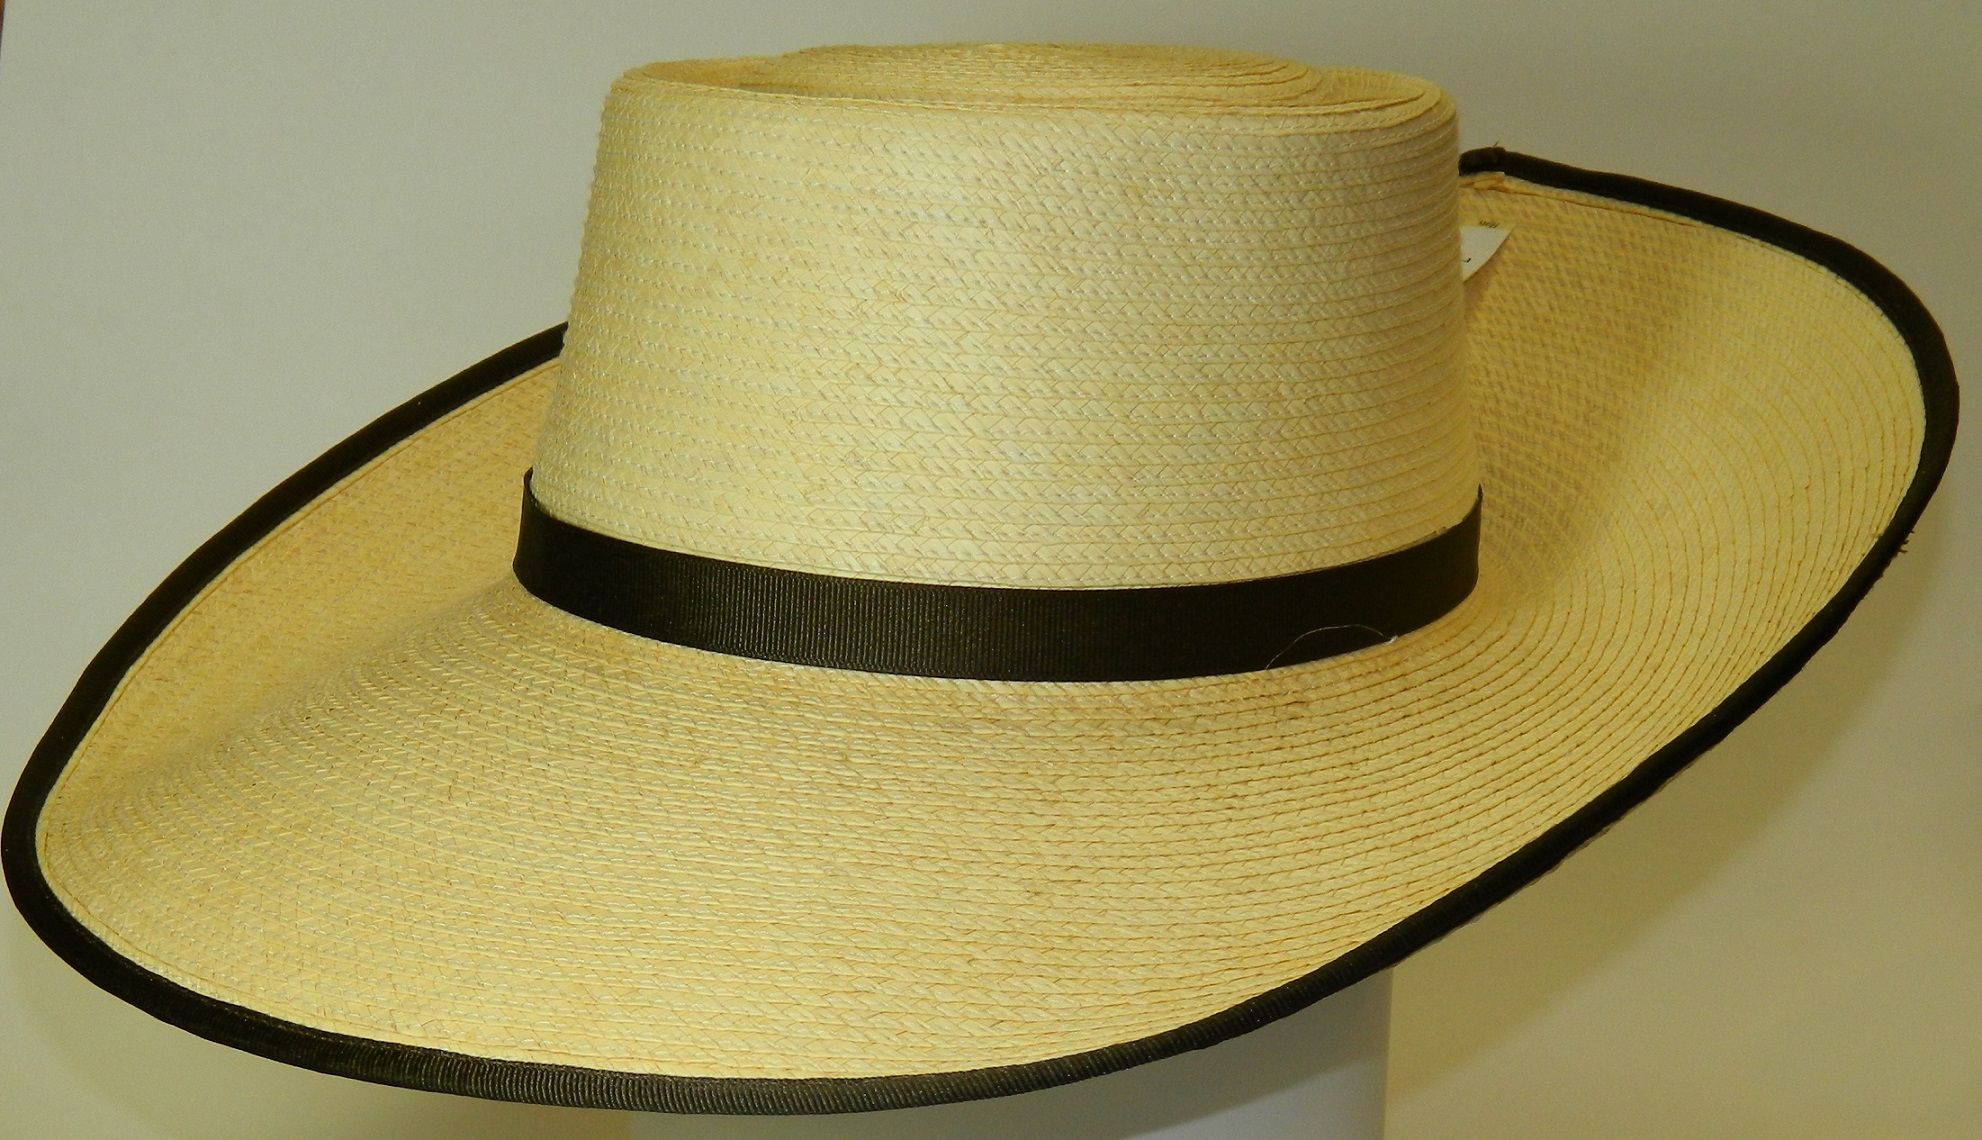 aaba90472f9a3 Elko palm buckaroo hat from 33 Ranch   Saddlery